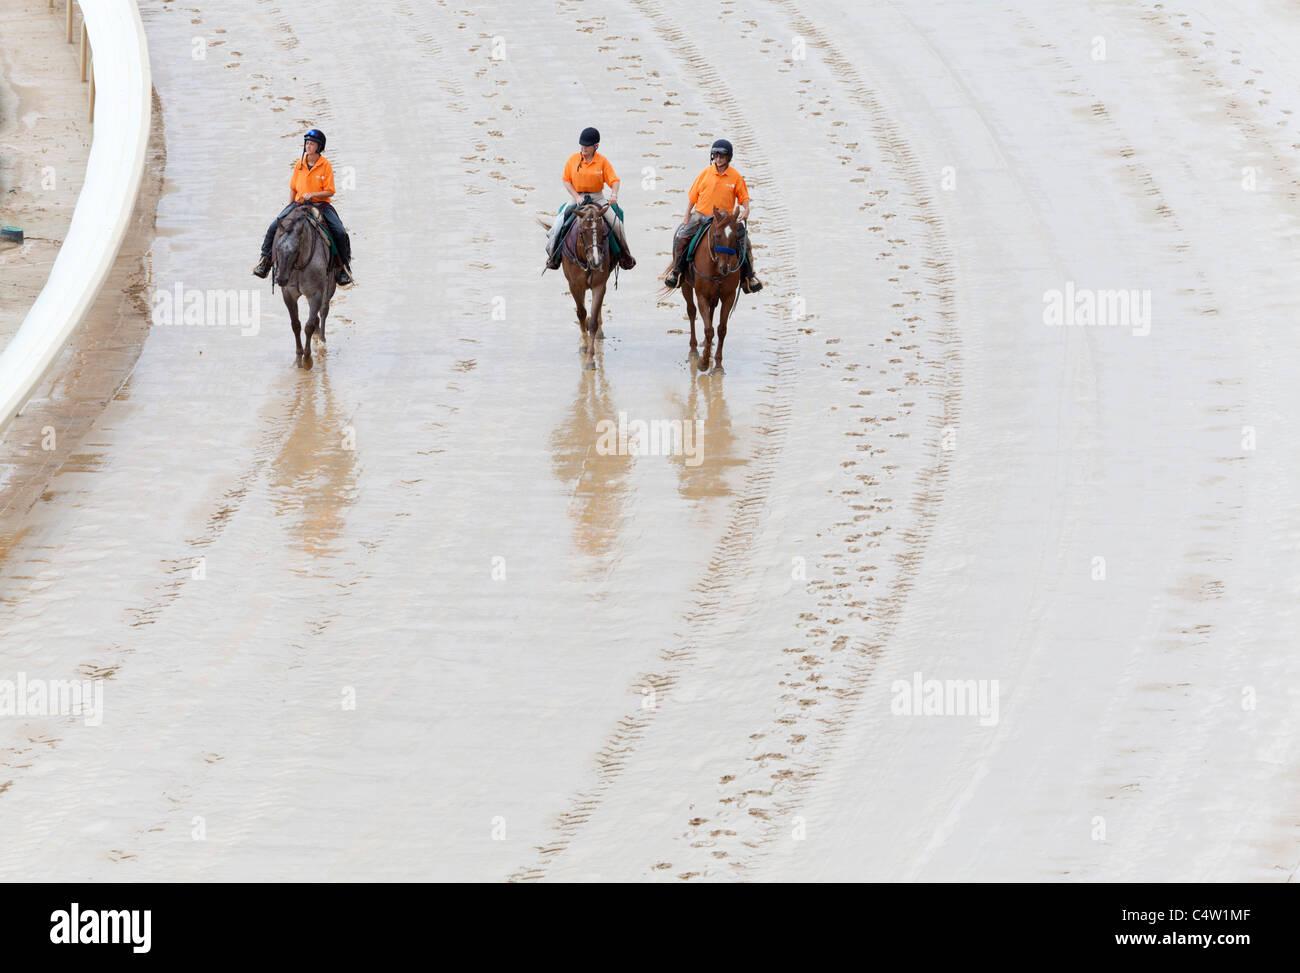 Churchill Downs horse race track - Stock Image